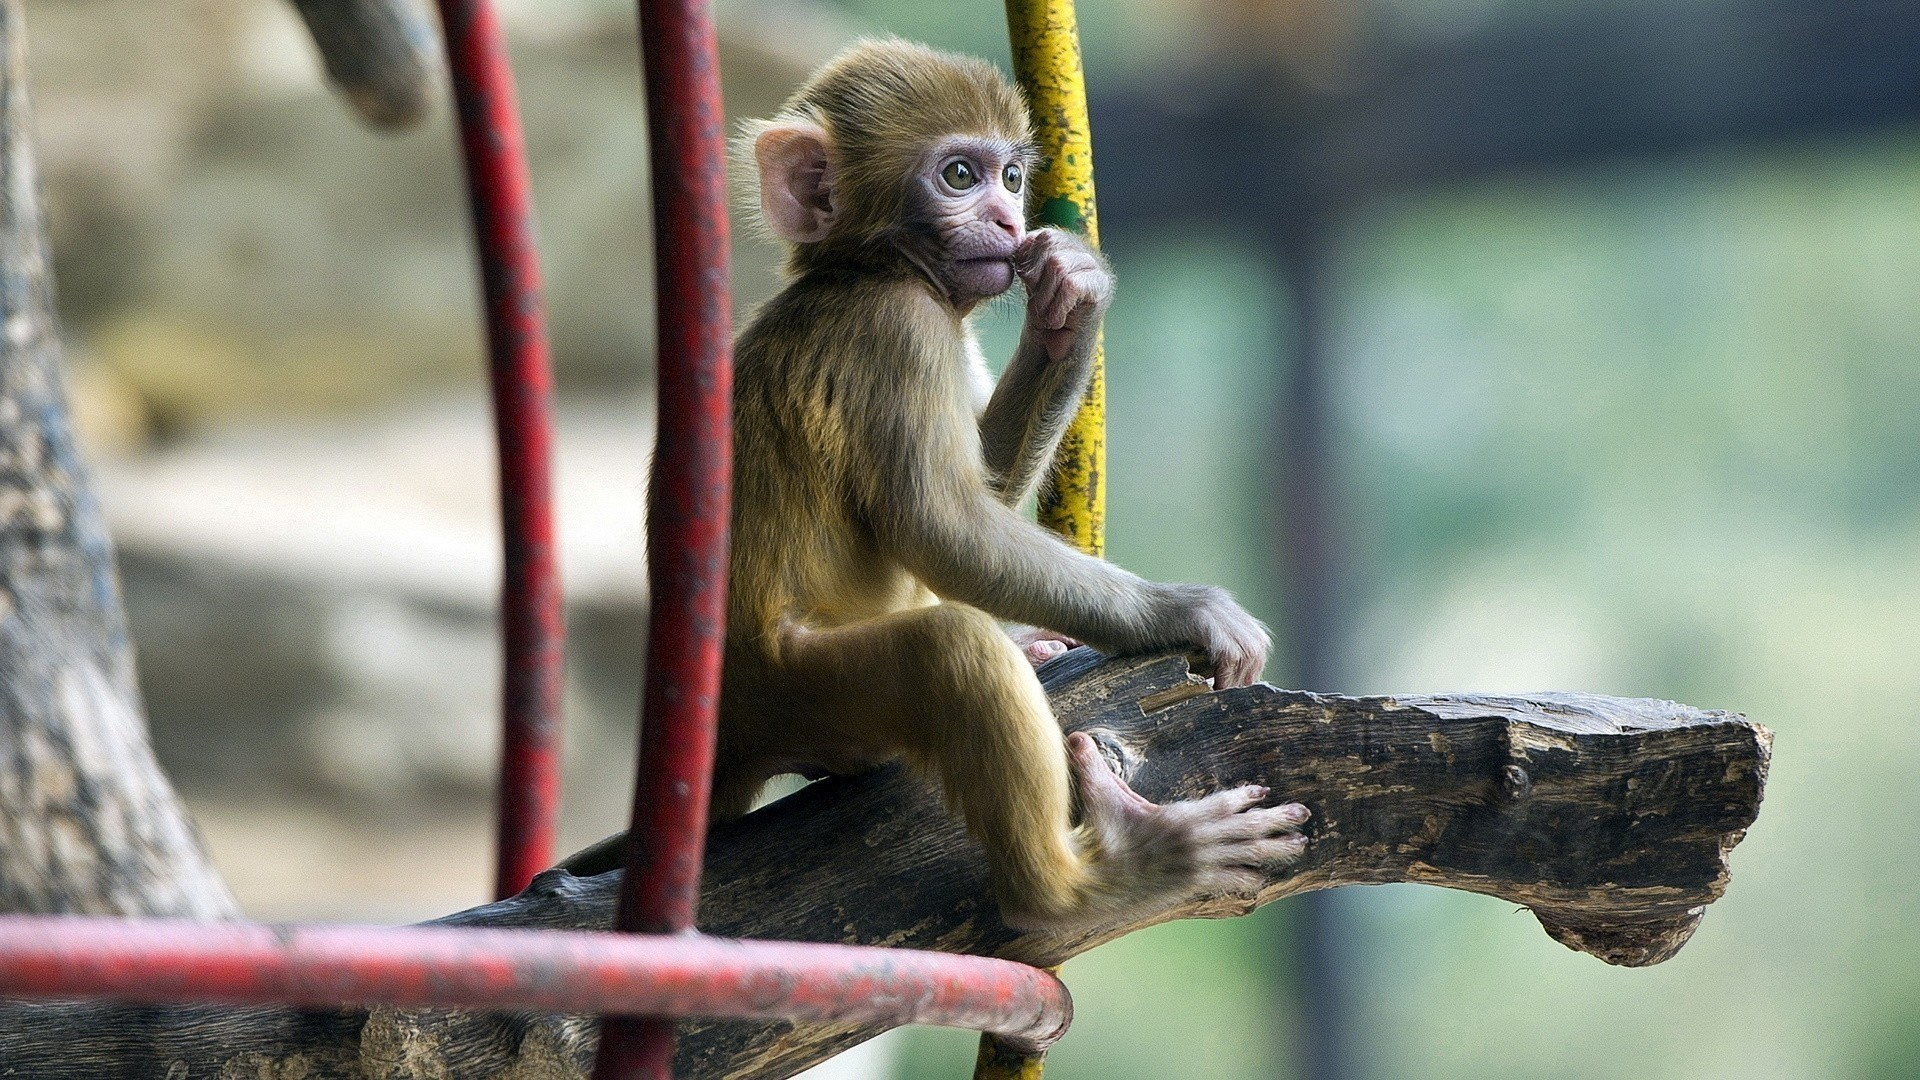 baby monkey desktop wallpaper 6479